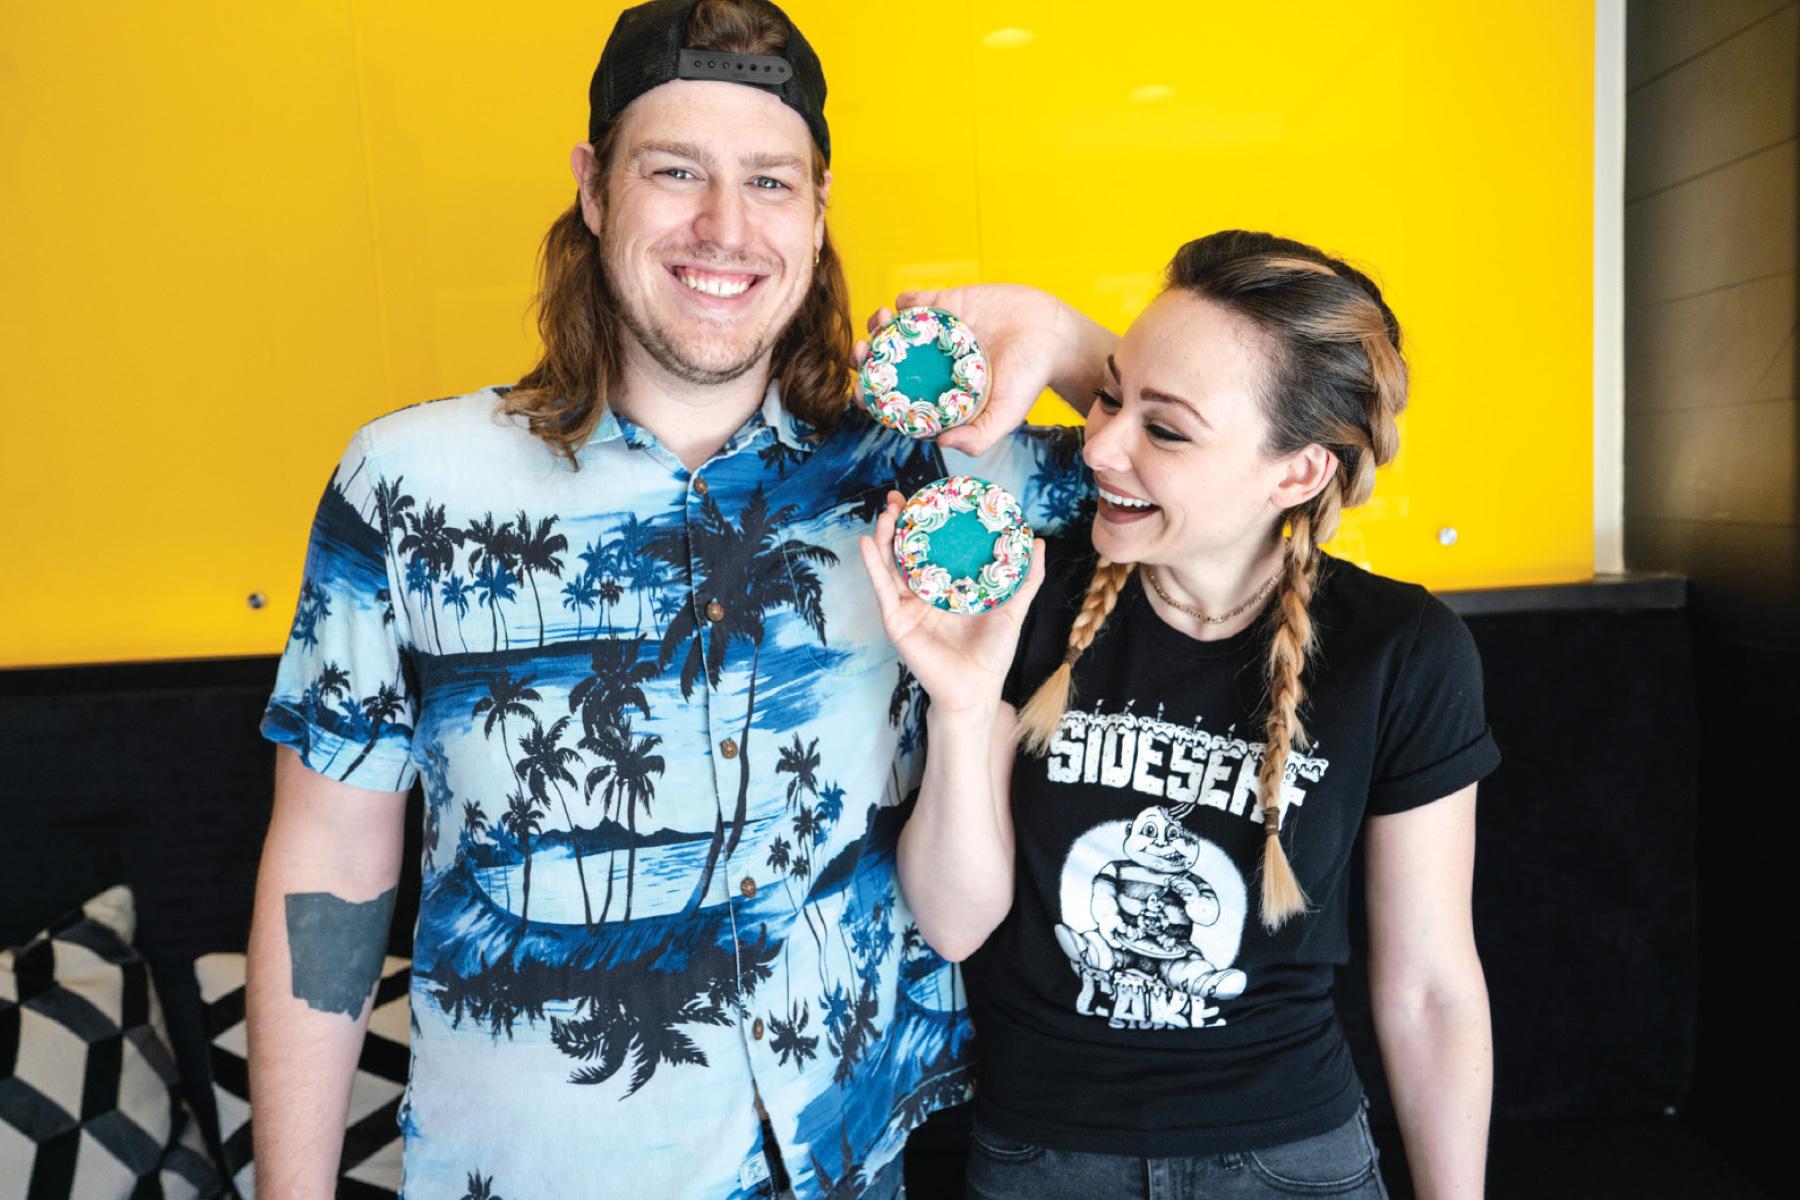 SideSerf Cake Studio's Dave and Natalie Sideserf